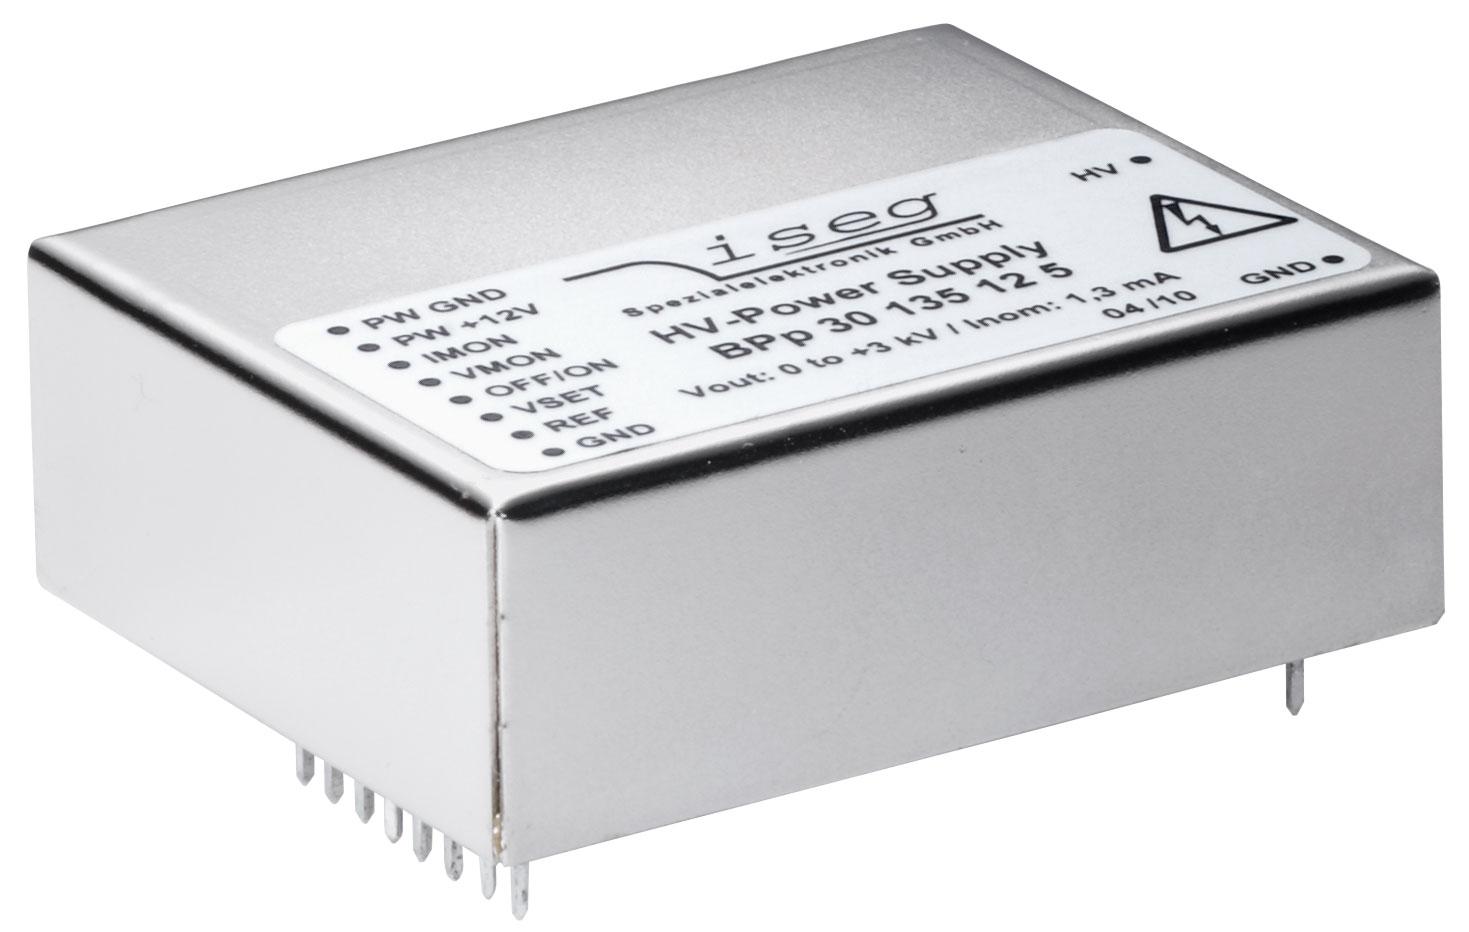 Convertisseur haute tension DC BPS polarite positive 3000 V lecture courant ISEG